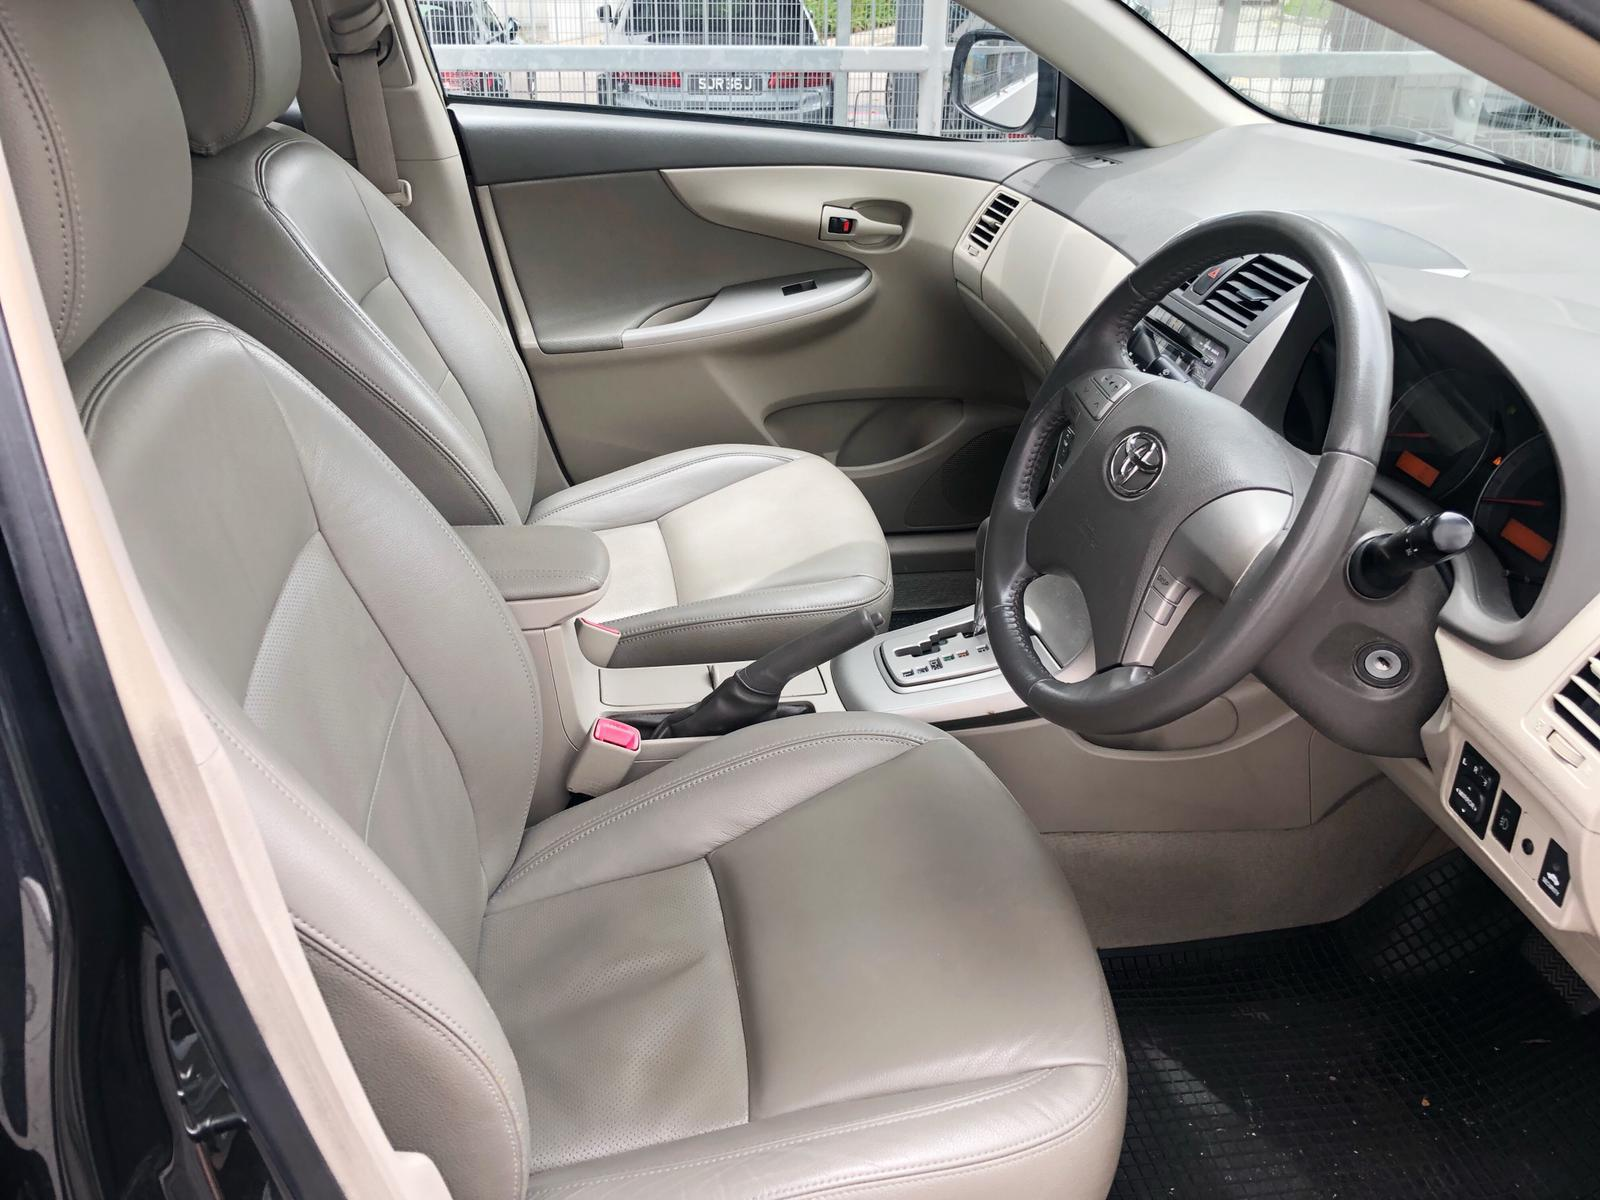 Toyota Altis 1.6a budget cheaper car rental gojek rebate incentive phv ready grab personal use